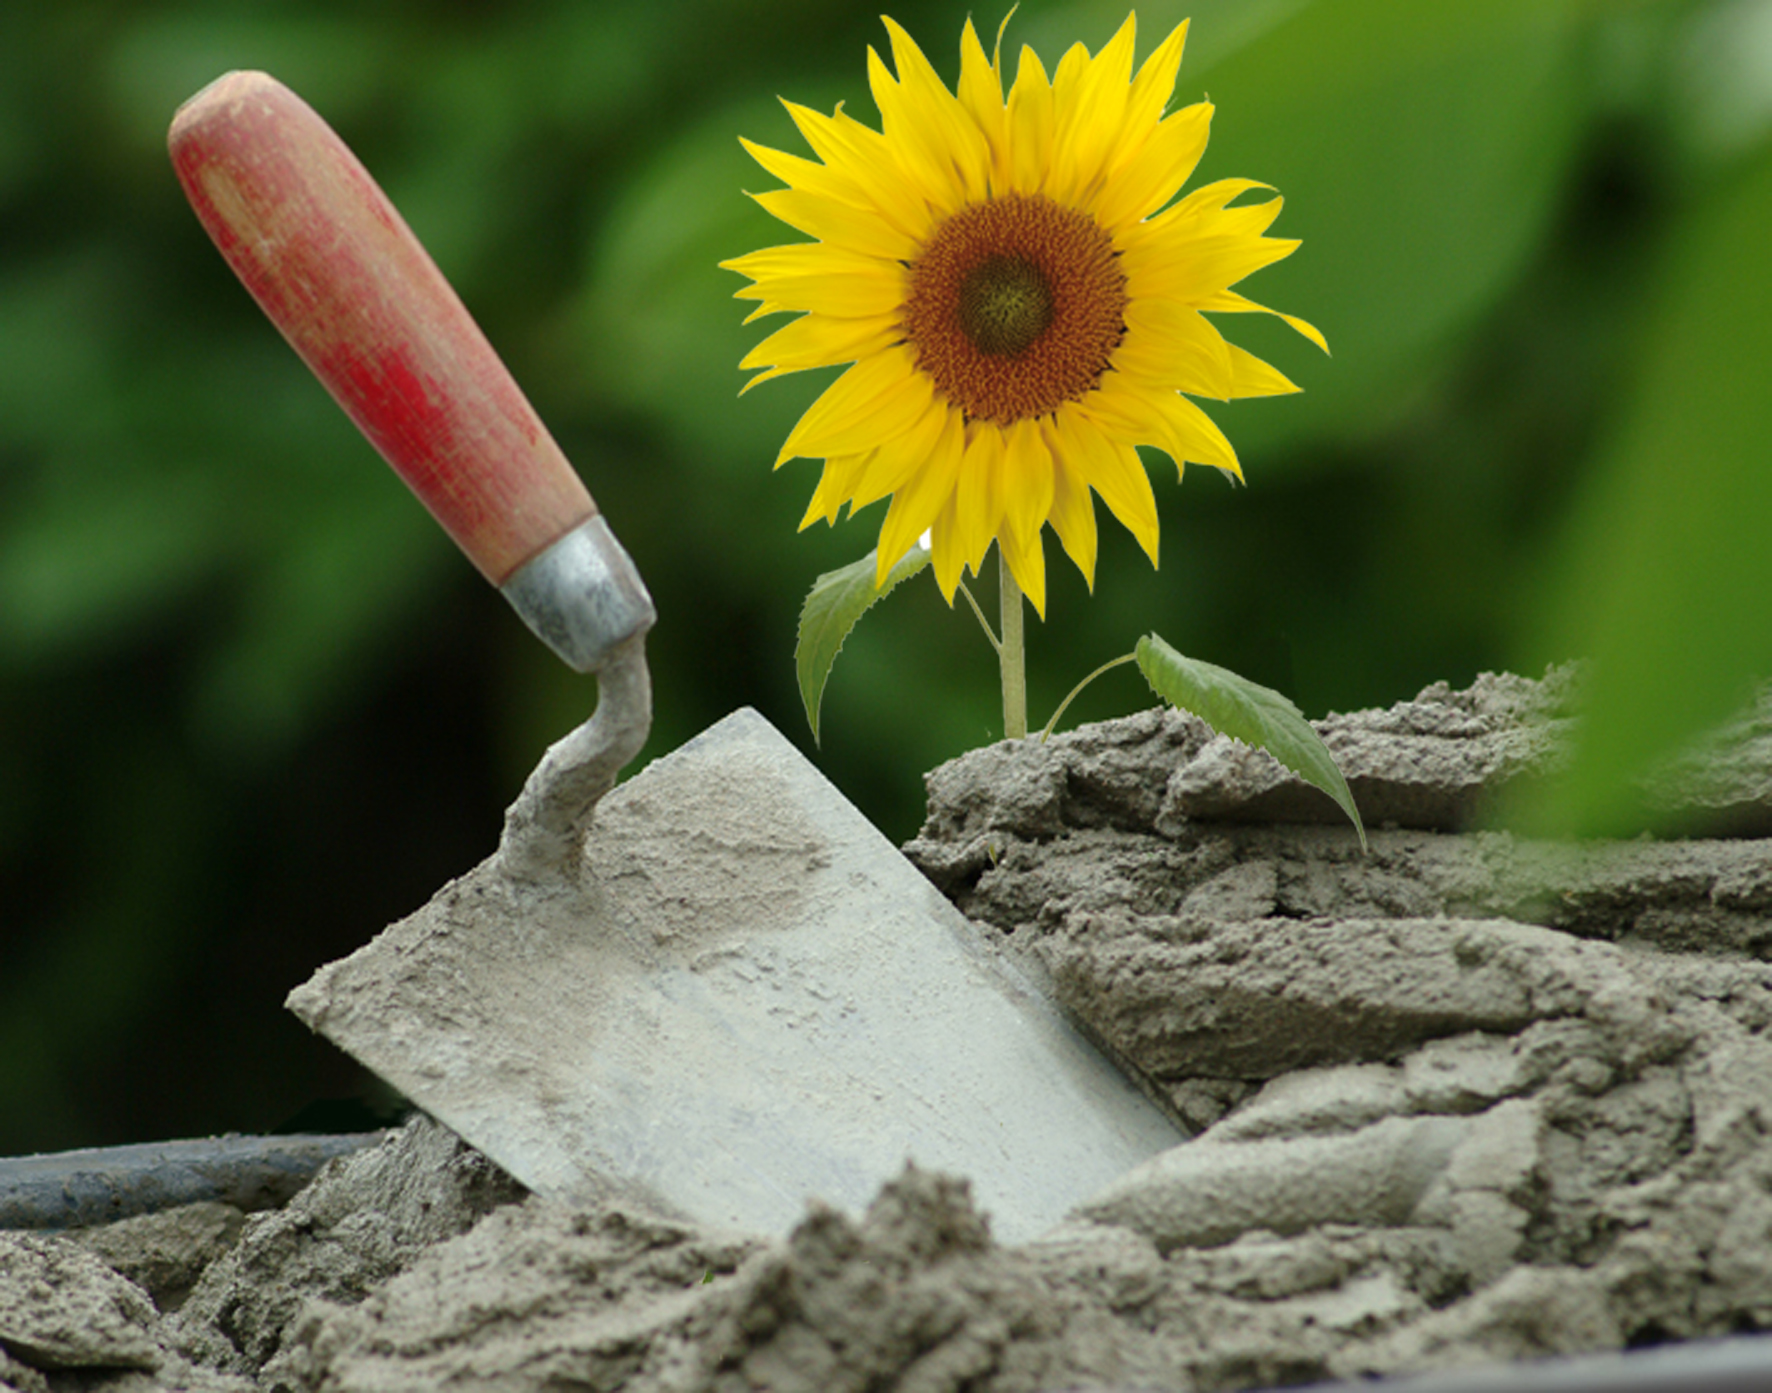 Standard Moertelkelle Mit Sonnenblume